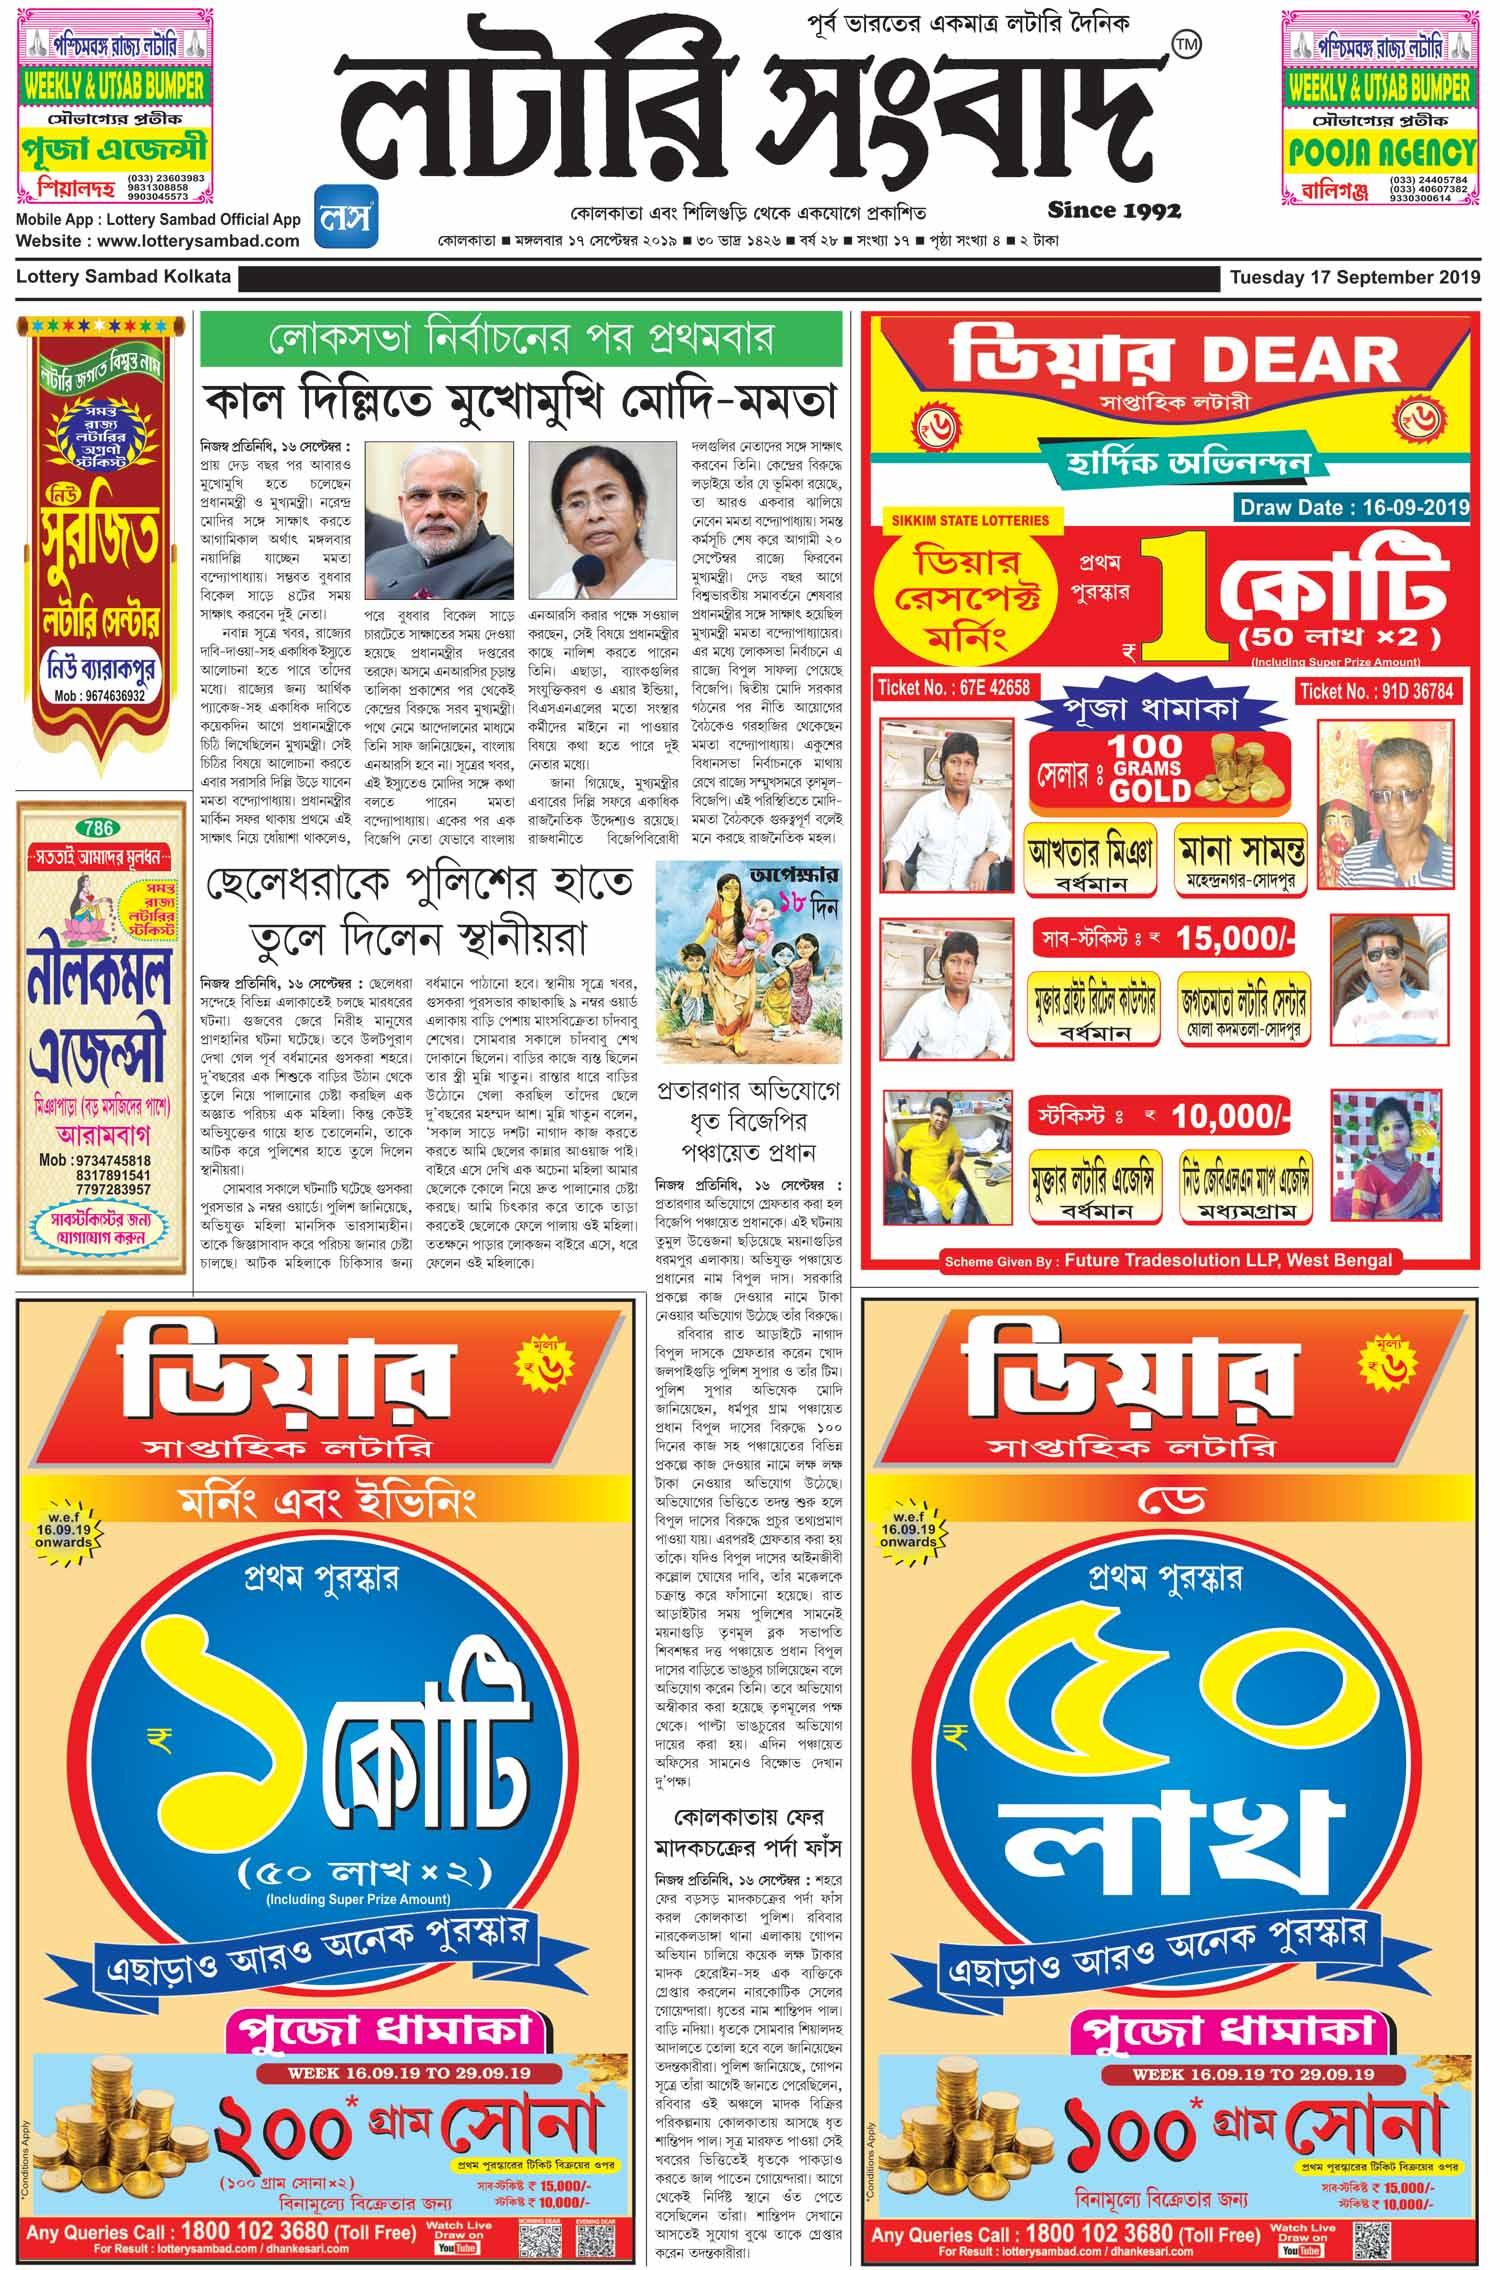 Epaper Sambad 17-09-2019 page 1